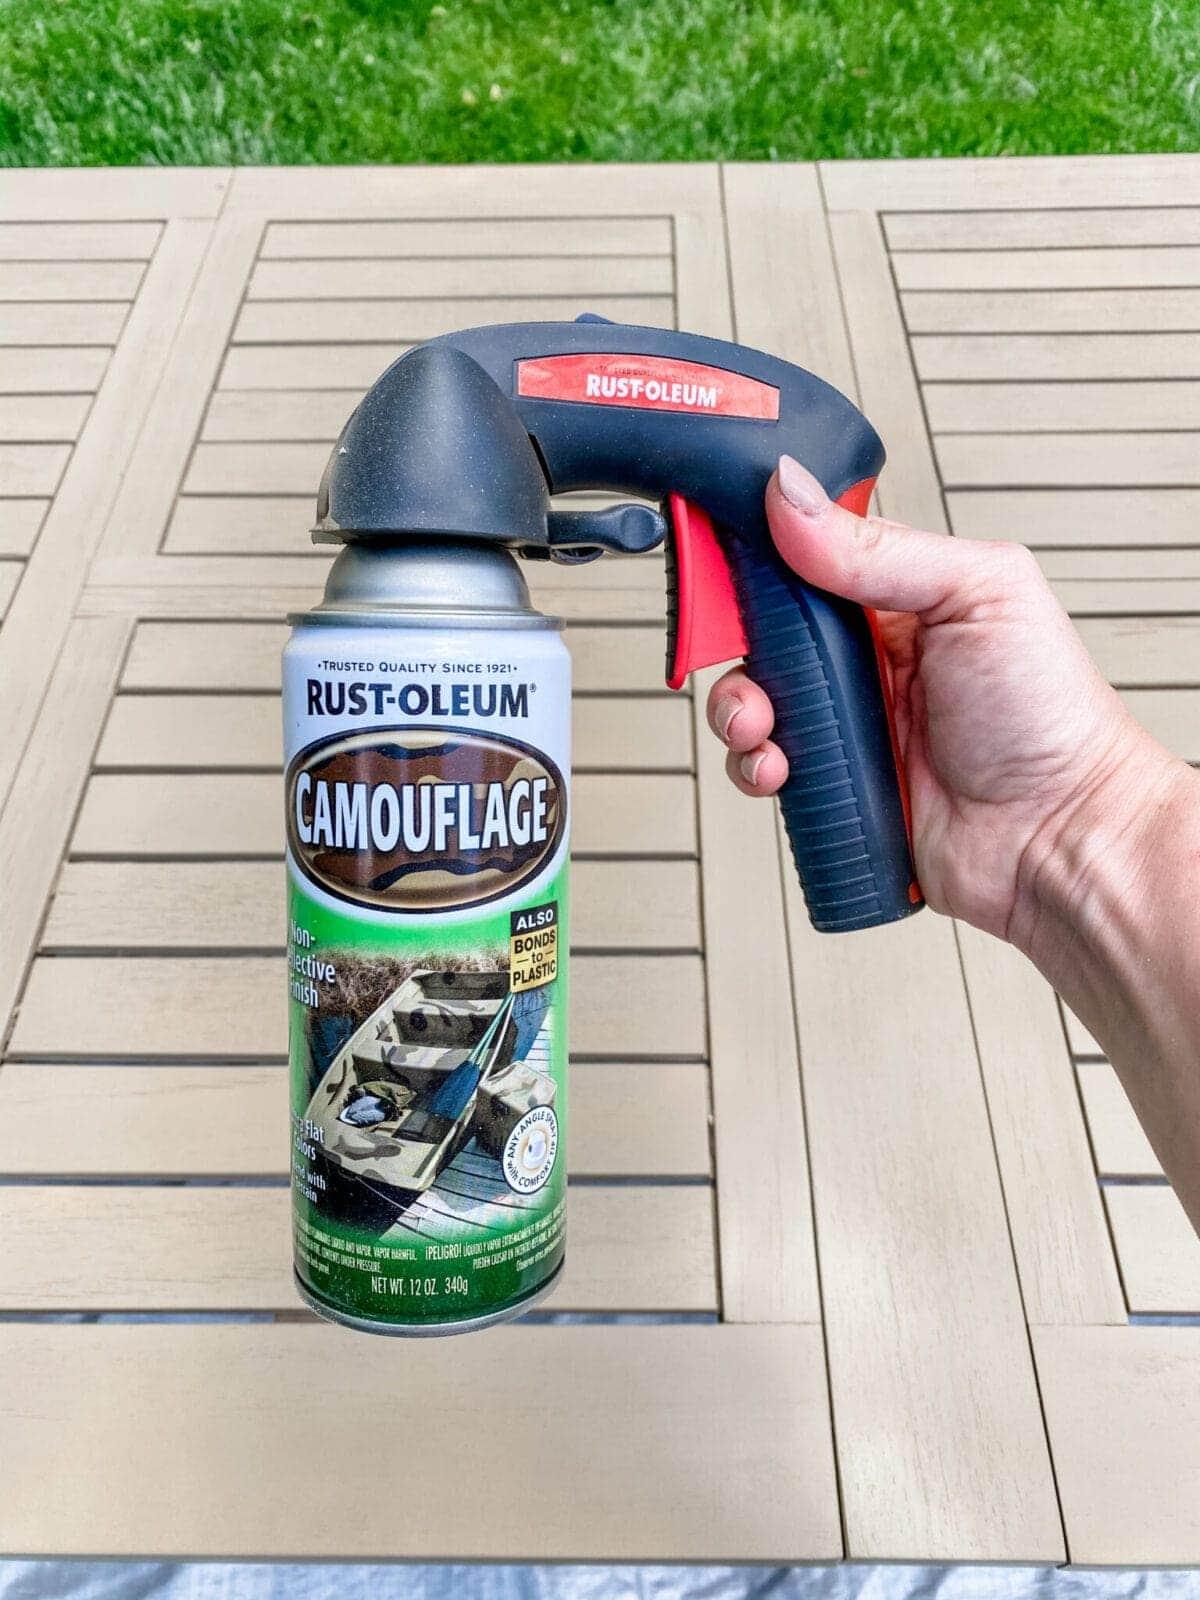 comfort grip for better spray paint application